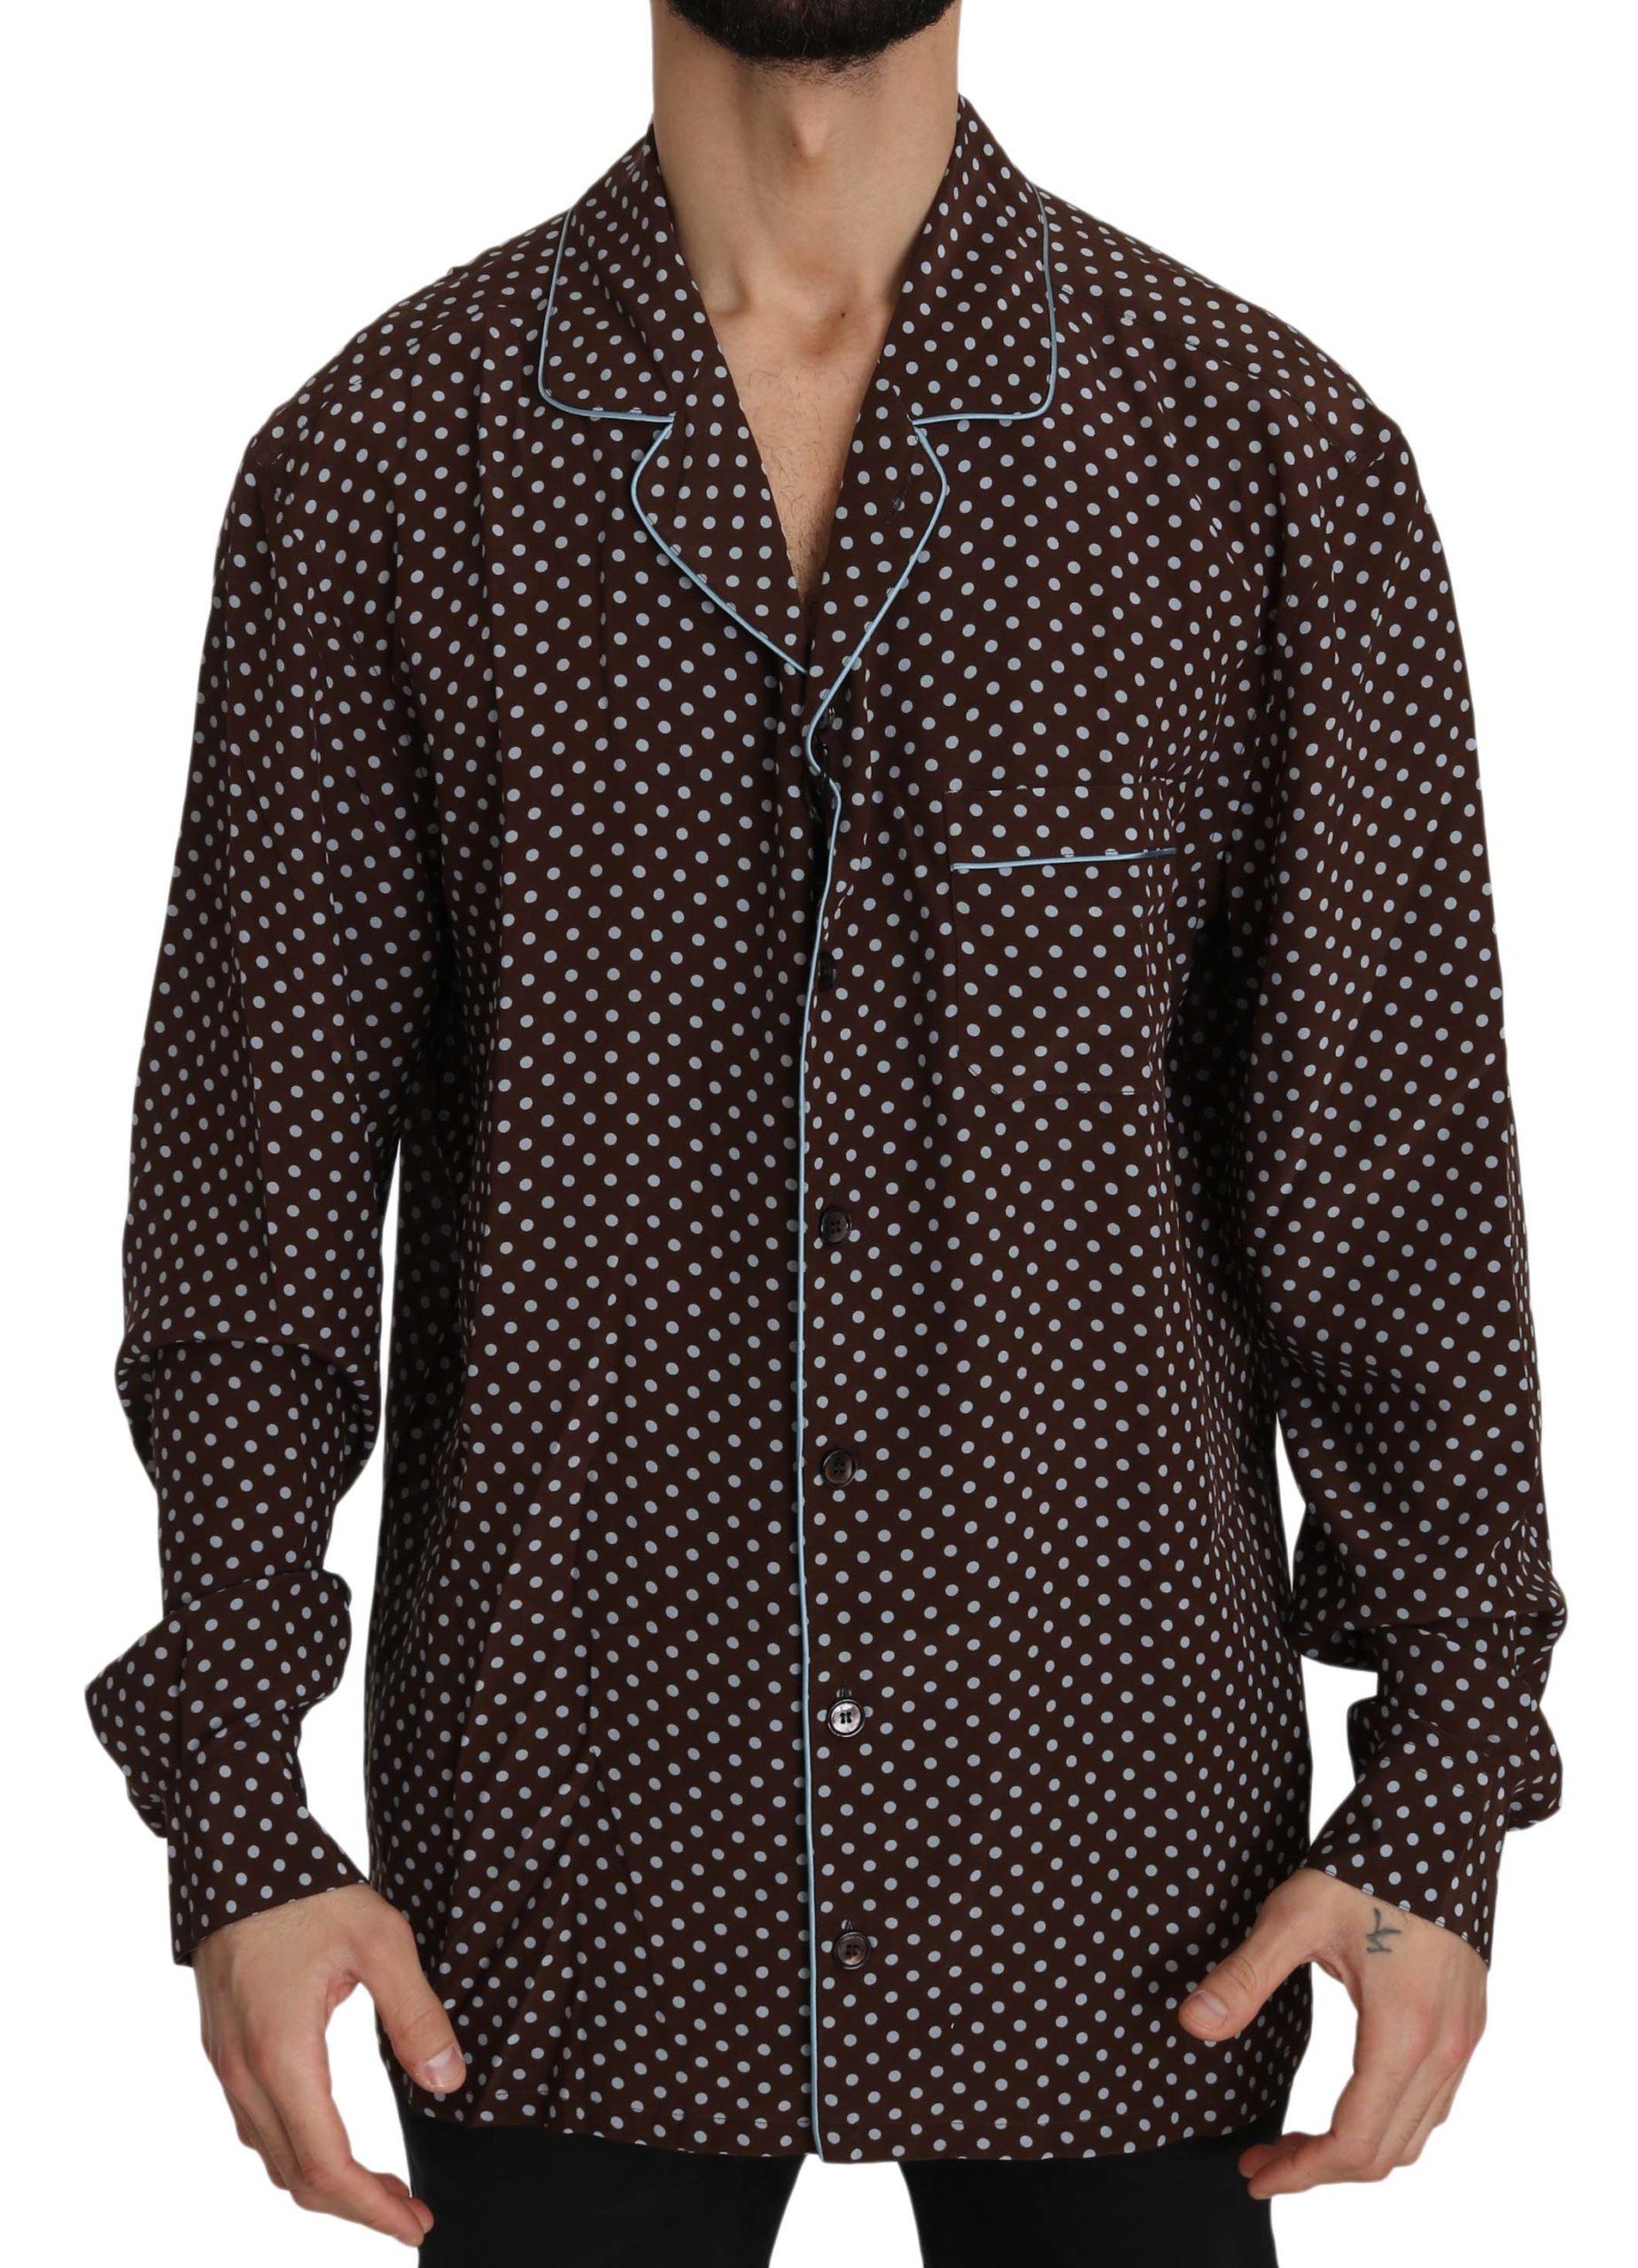 Dolce & Gabbana Men's Shirt Brown TSH3361 - IT39   S